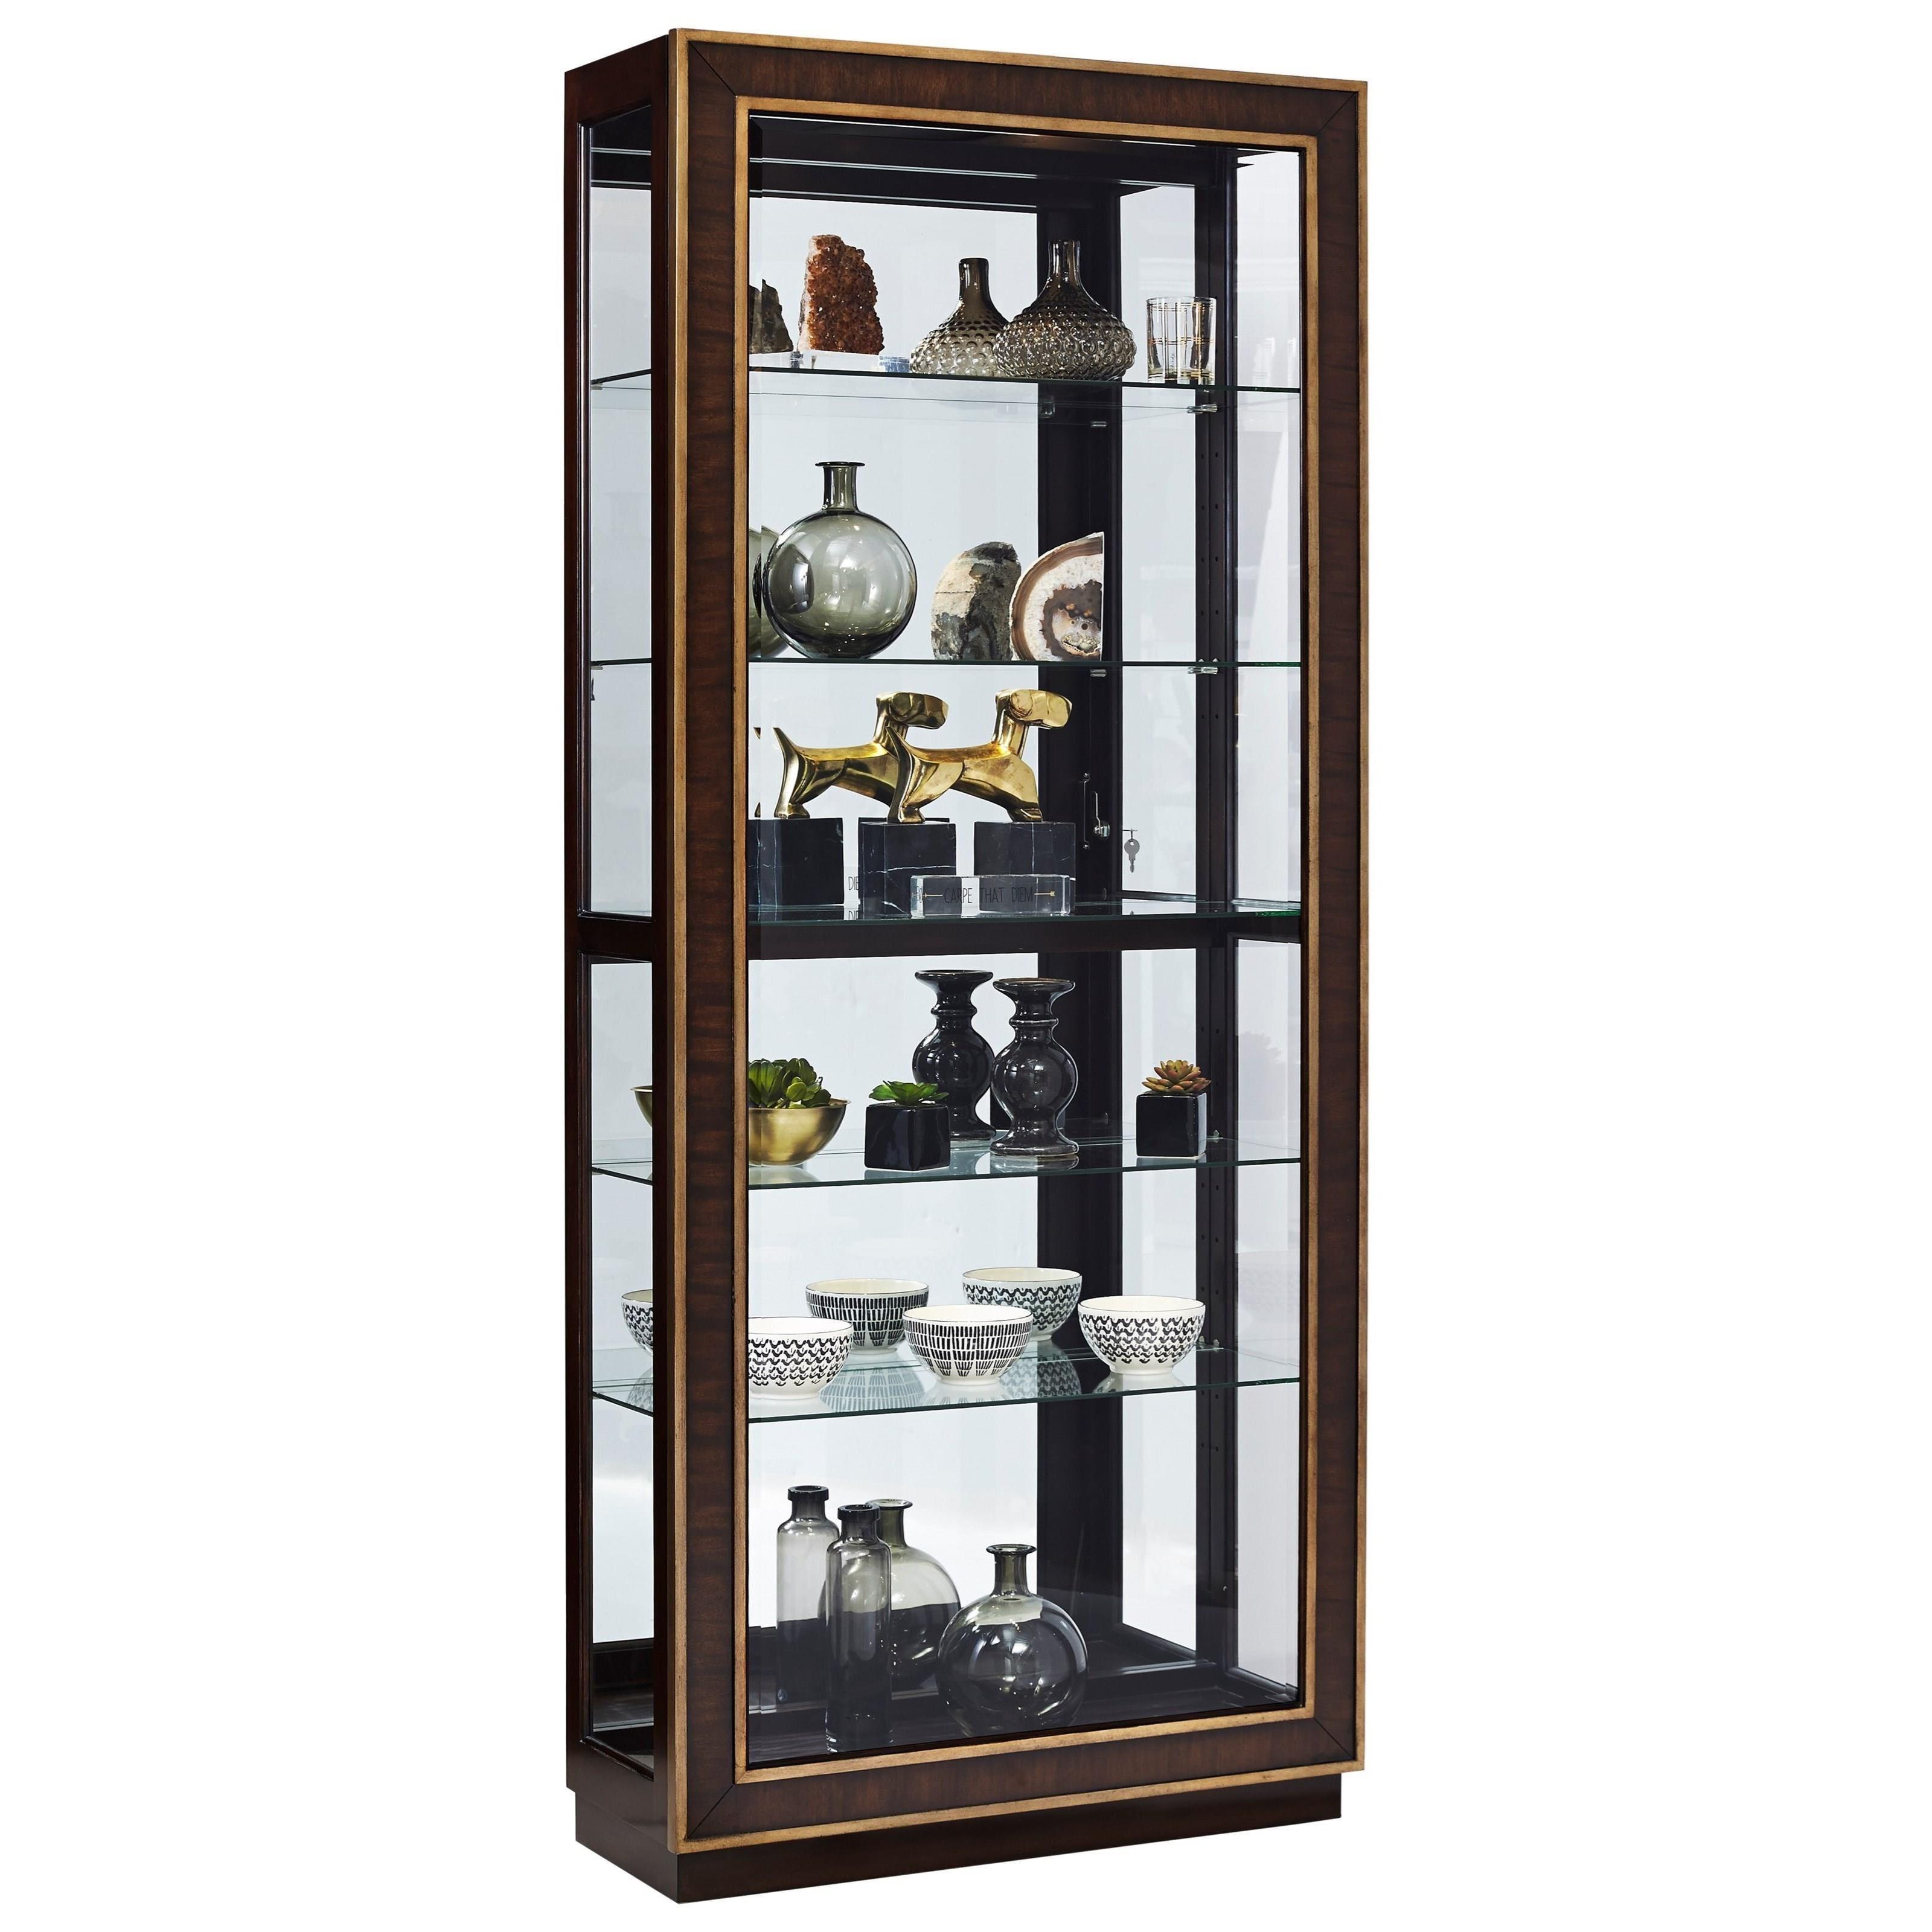 Pulaski Furniture Store: Pulaski Furniture Curios Contemporary Curio With Touch